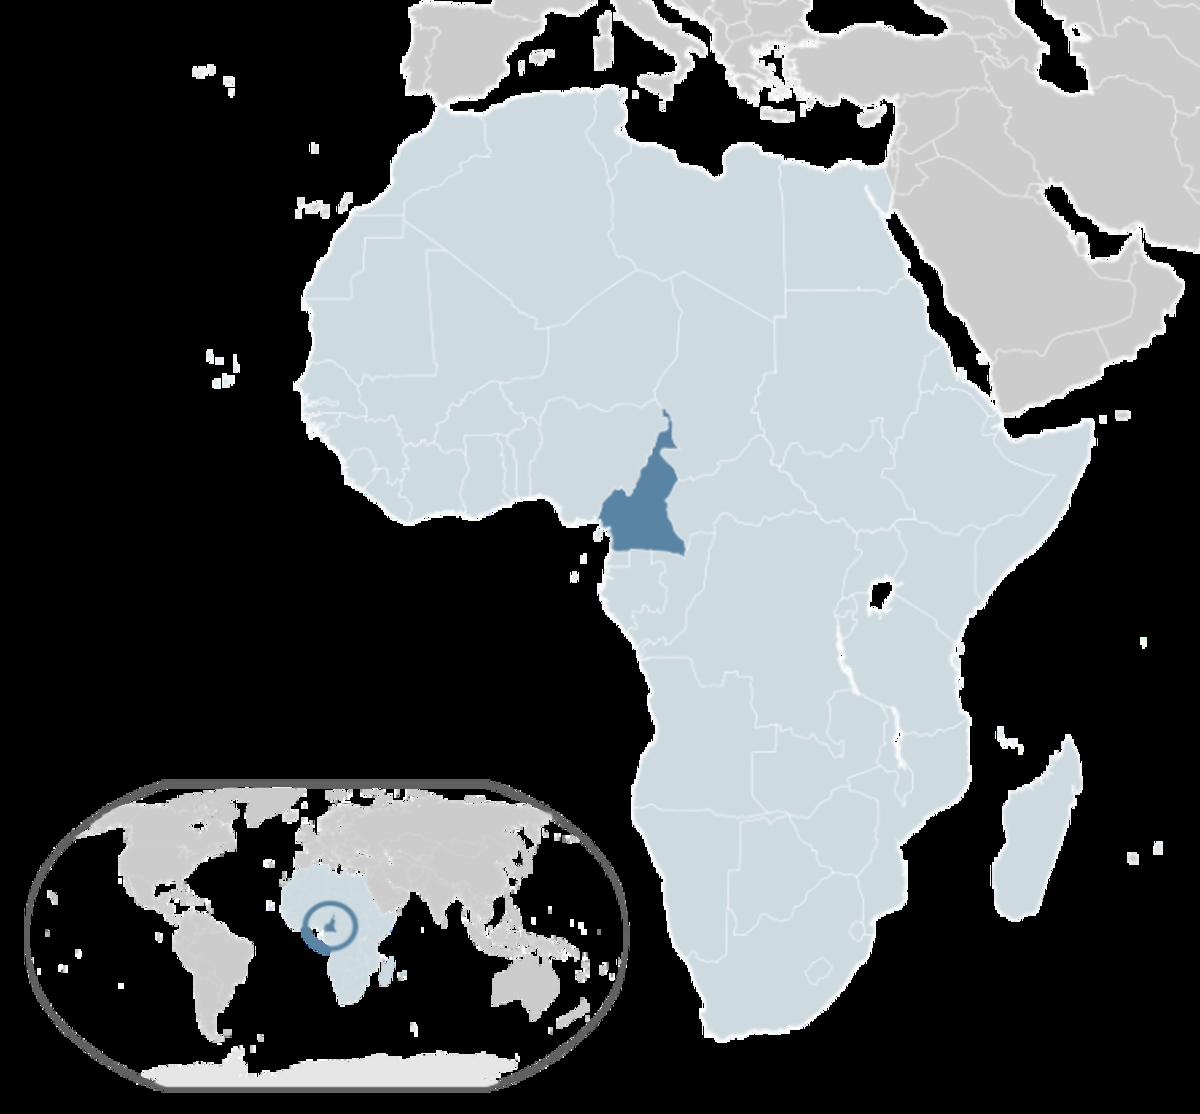 Republic of Cameroon